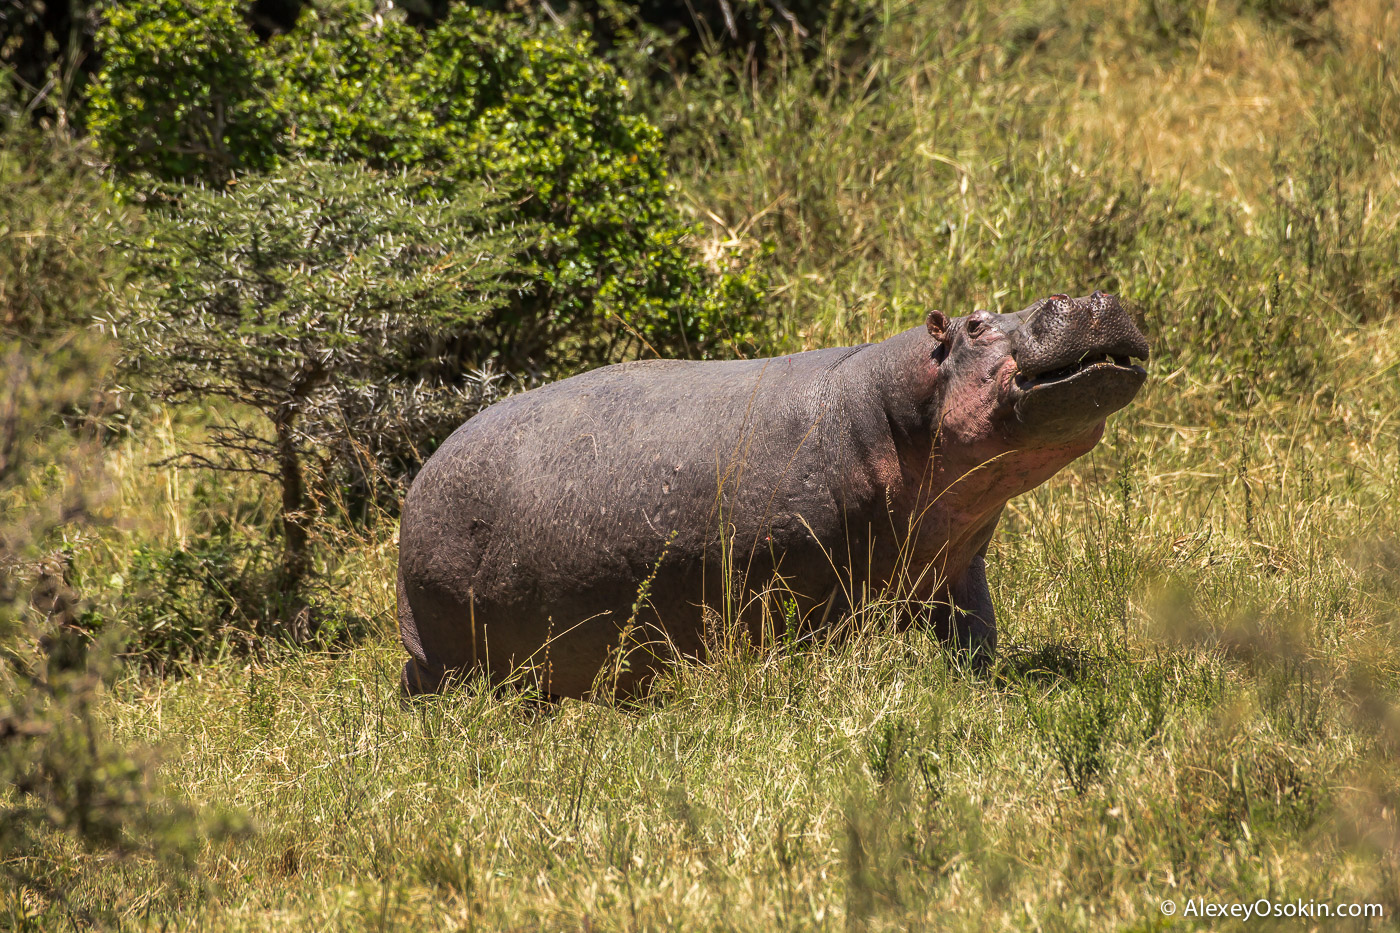 kenya - hippos-ao, aug.2015-16.jpg